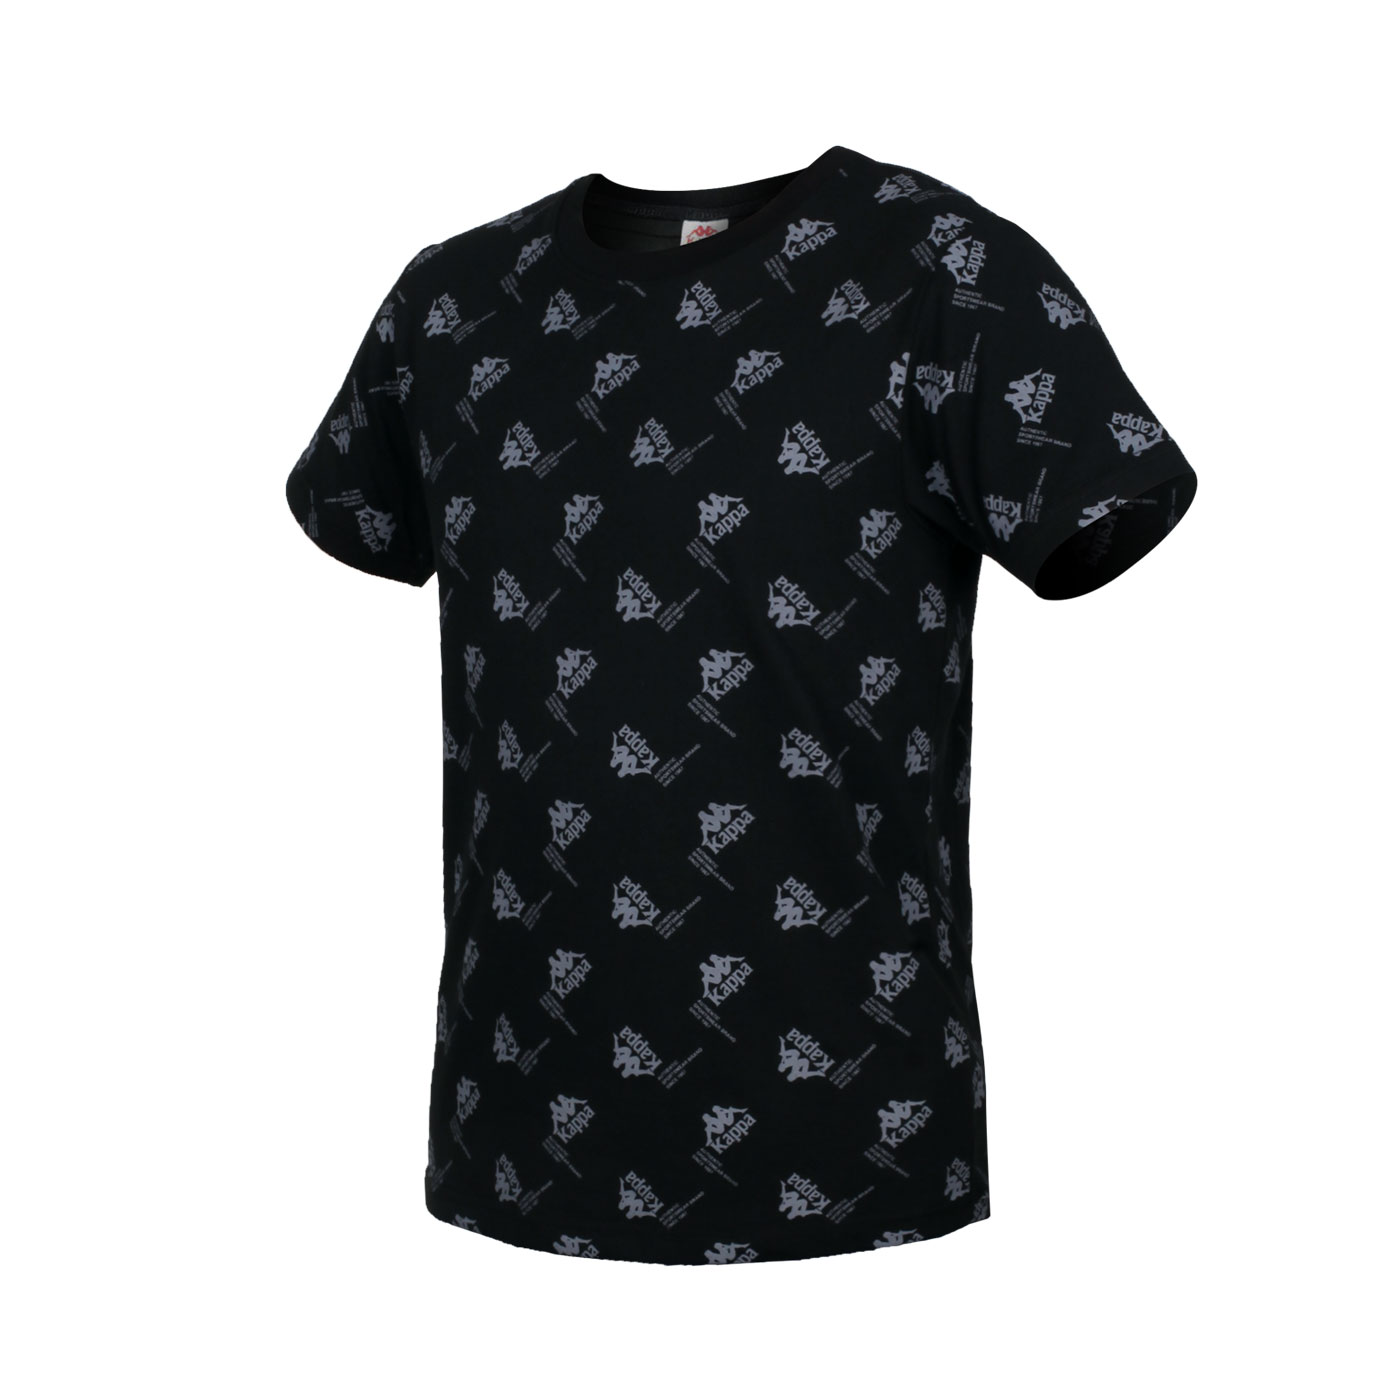 KAPPA 男款短袖T恤 321876W-005 - 黑灰